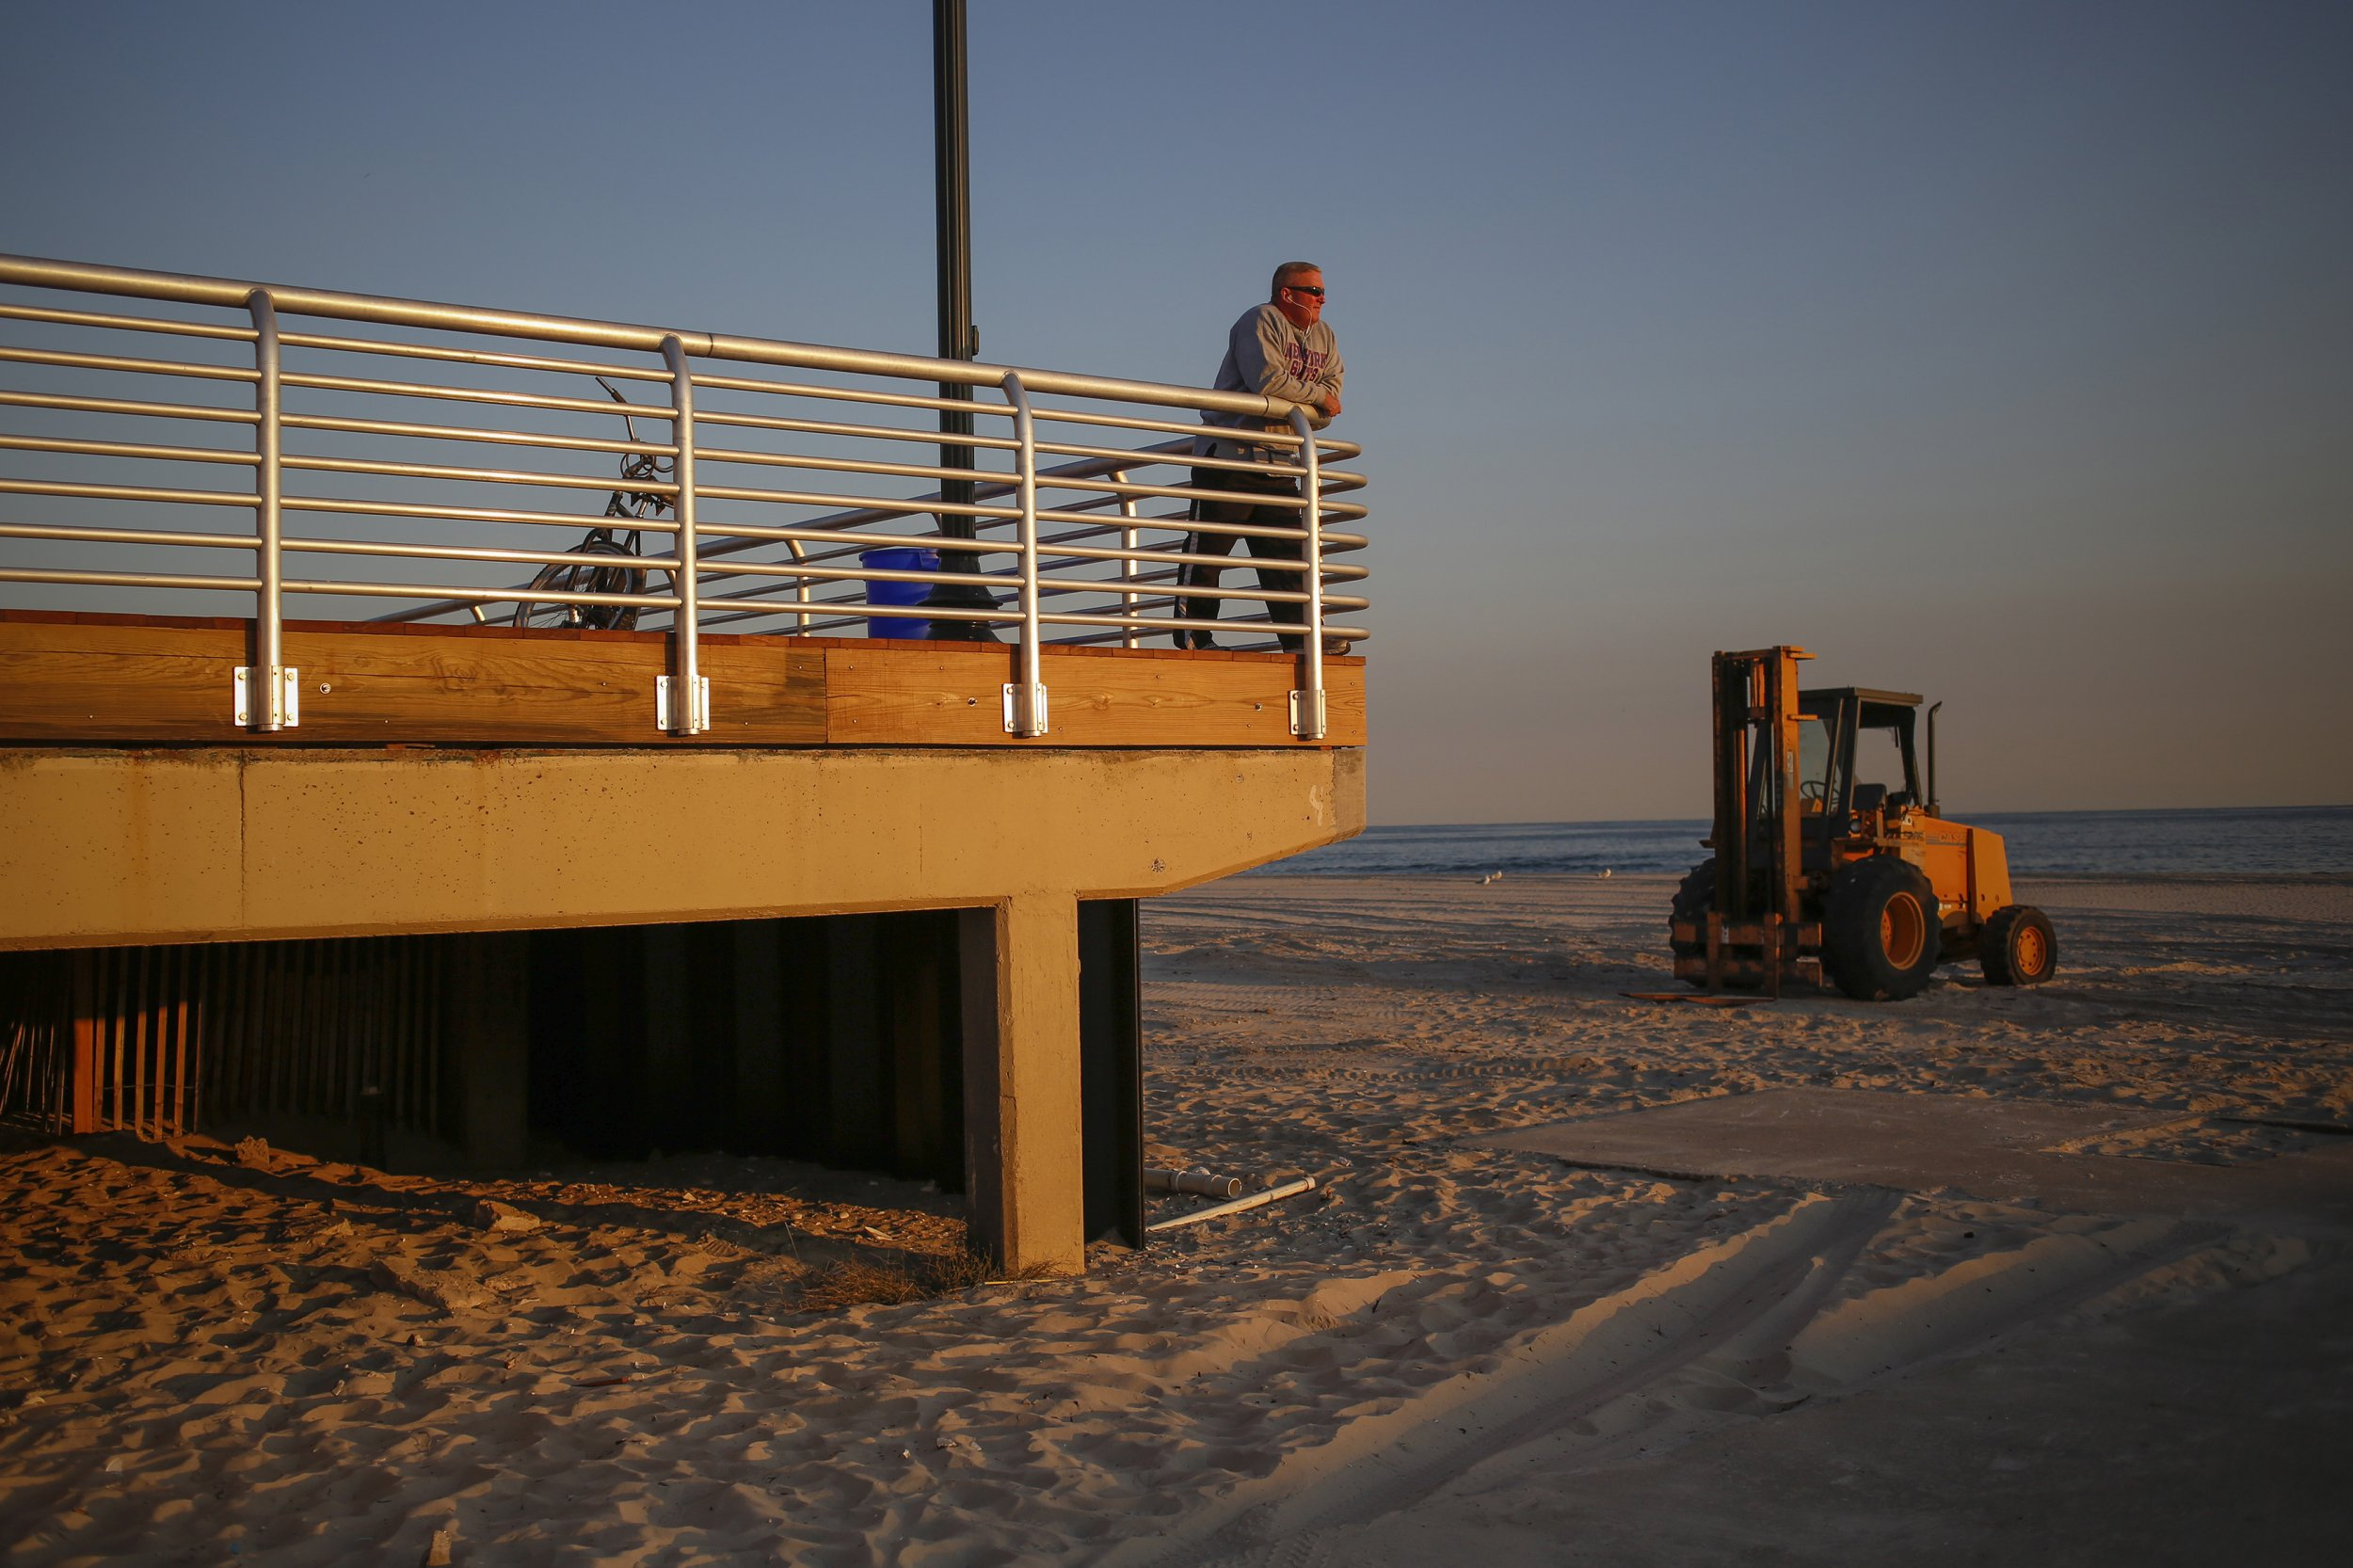 10-29-14 Sandy Long Beach 1 yr anniversary